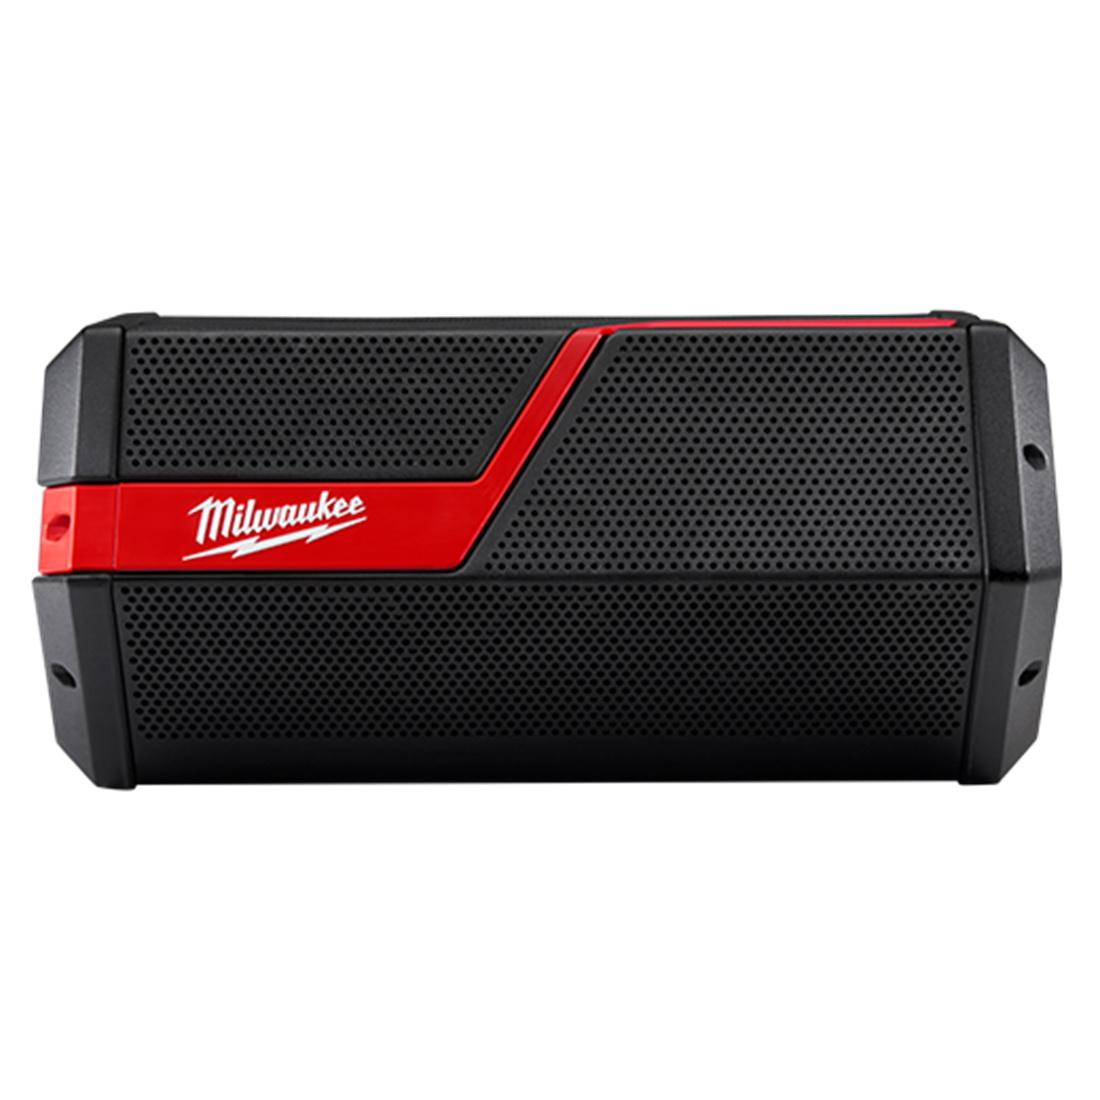 M12/M18 Wireless Bluetooth Jobsite Speaker (Tool Only)